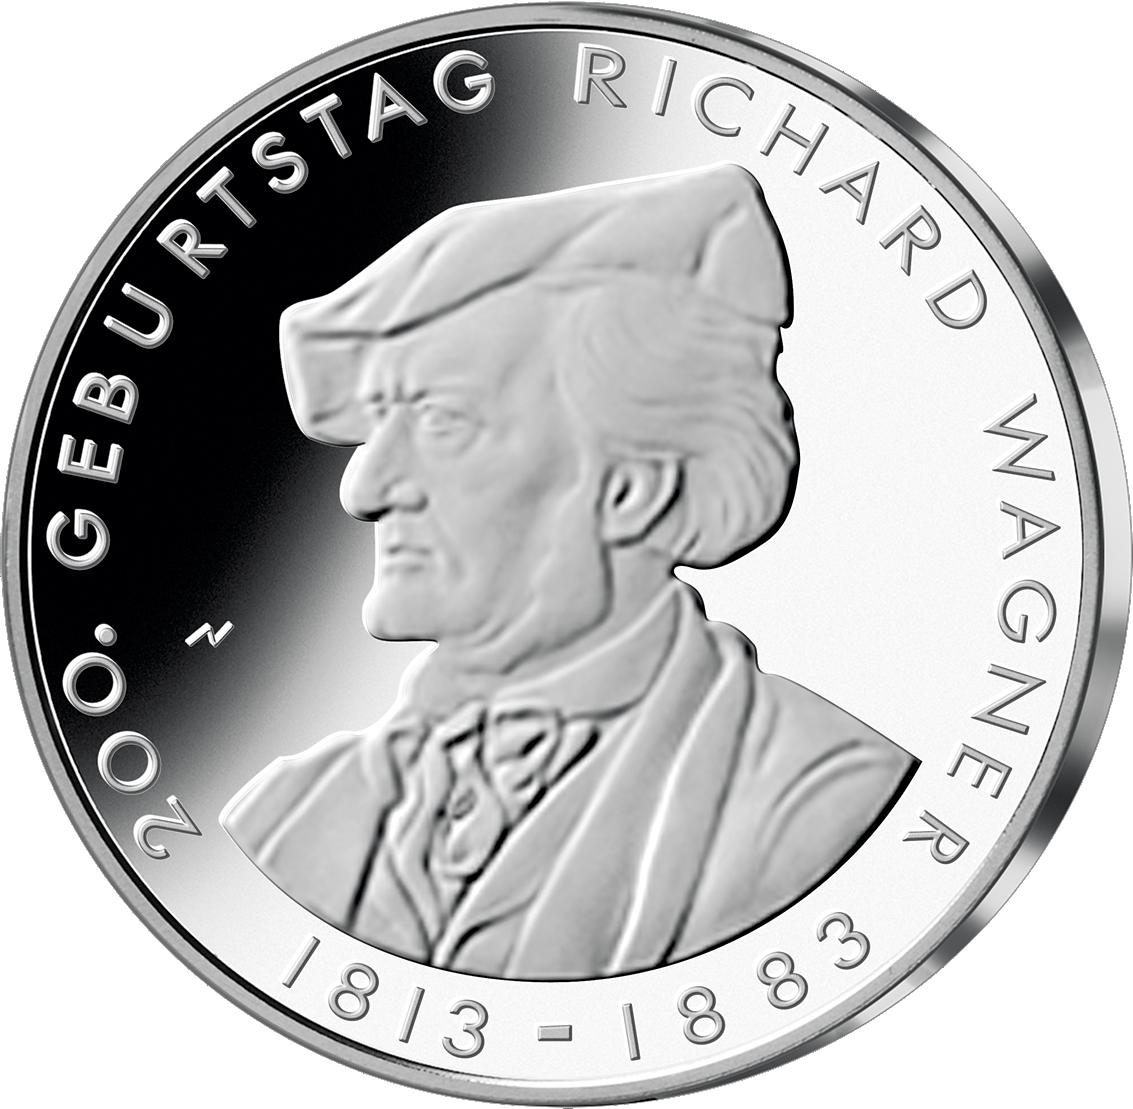 10 Euro Münze Brd Richard Wagner 2013 10 Euro Münzen Euro Münzen